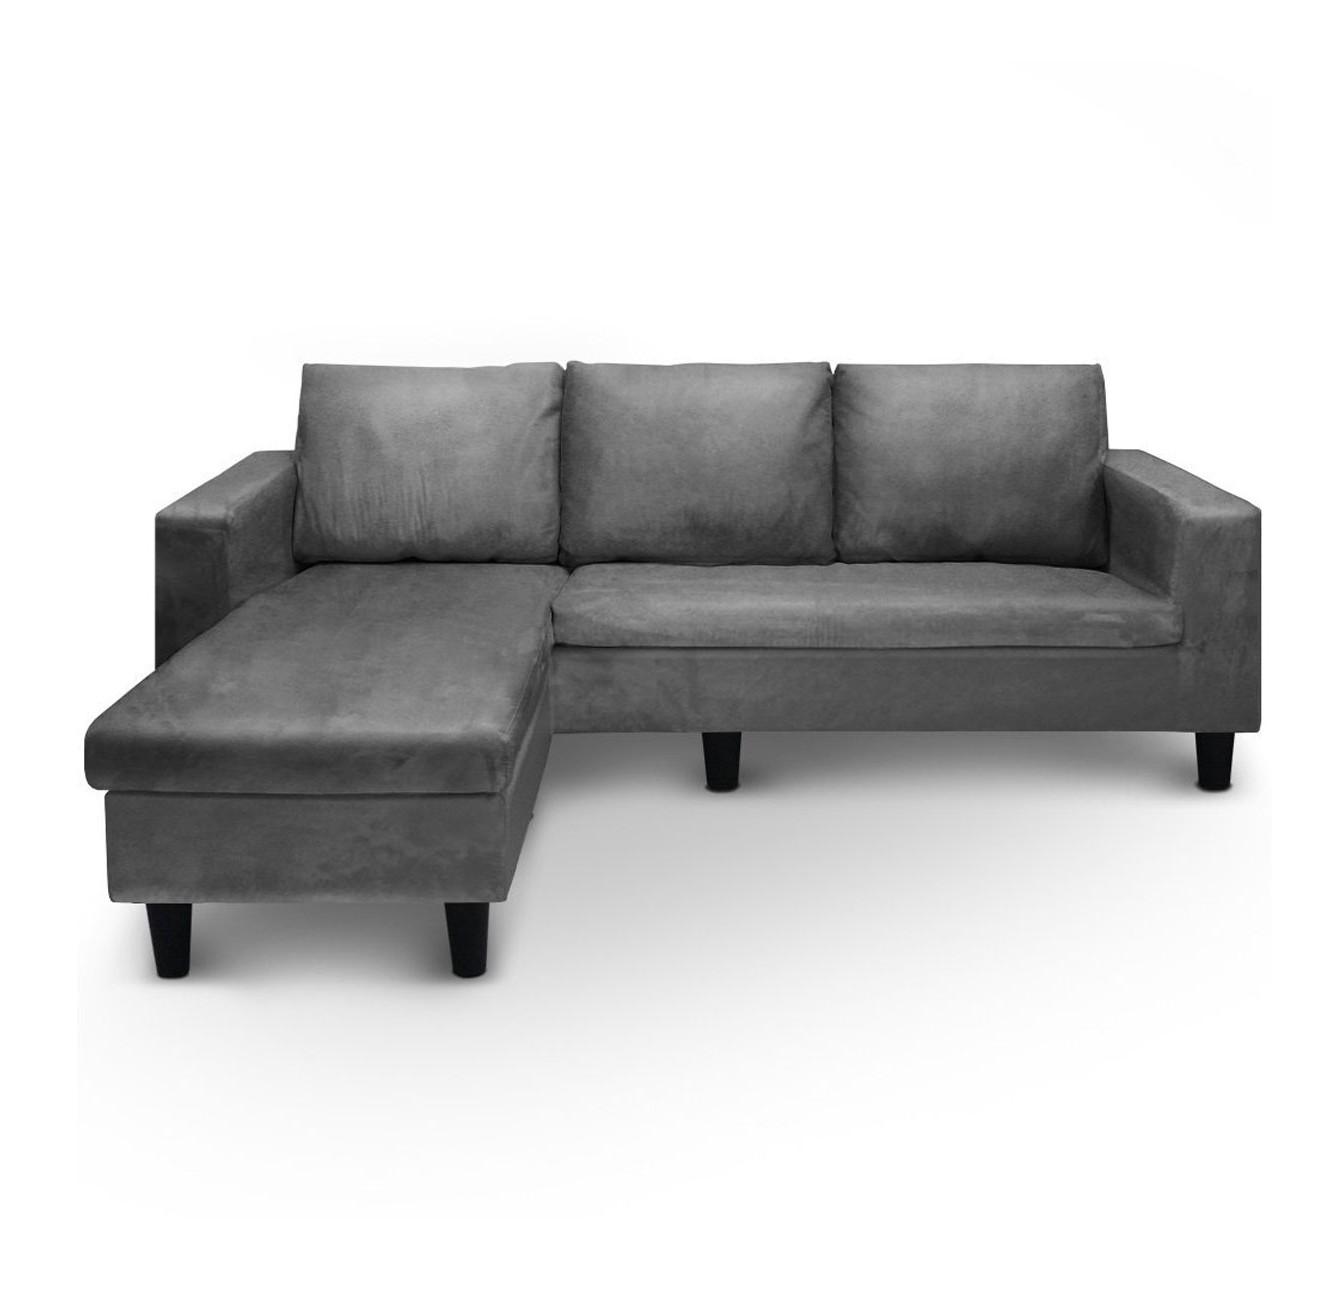 Canape D Angle Convertible Noir Simili Cuir